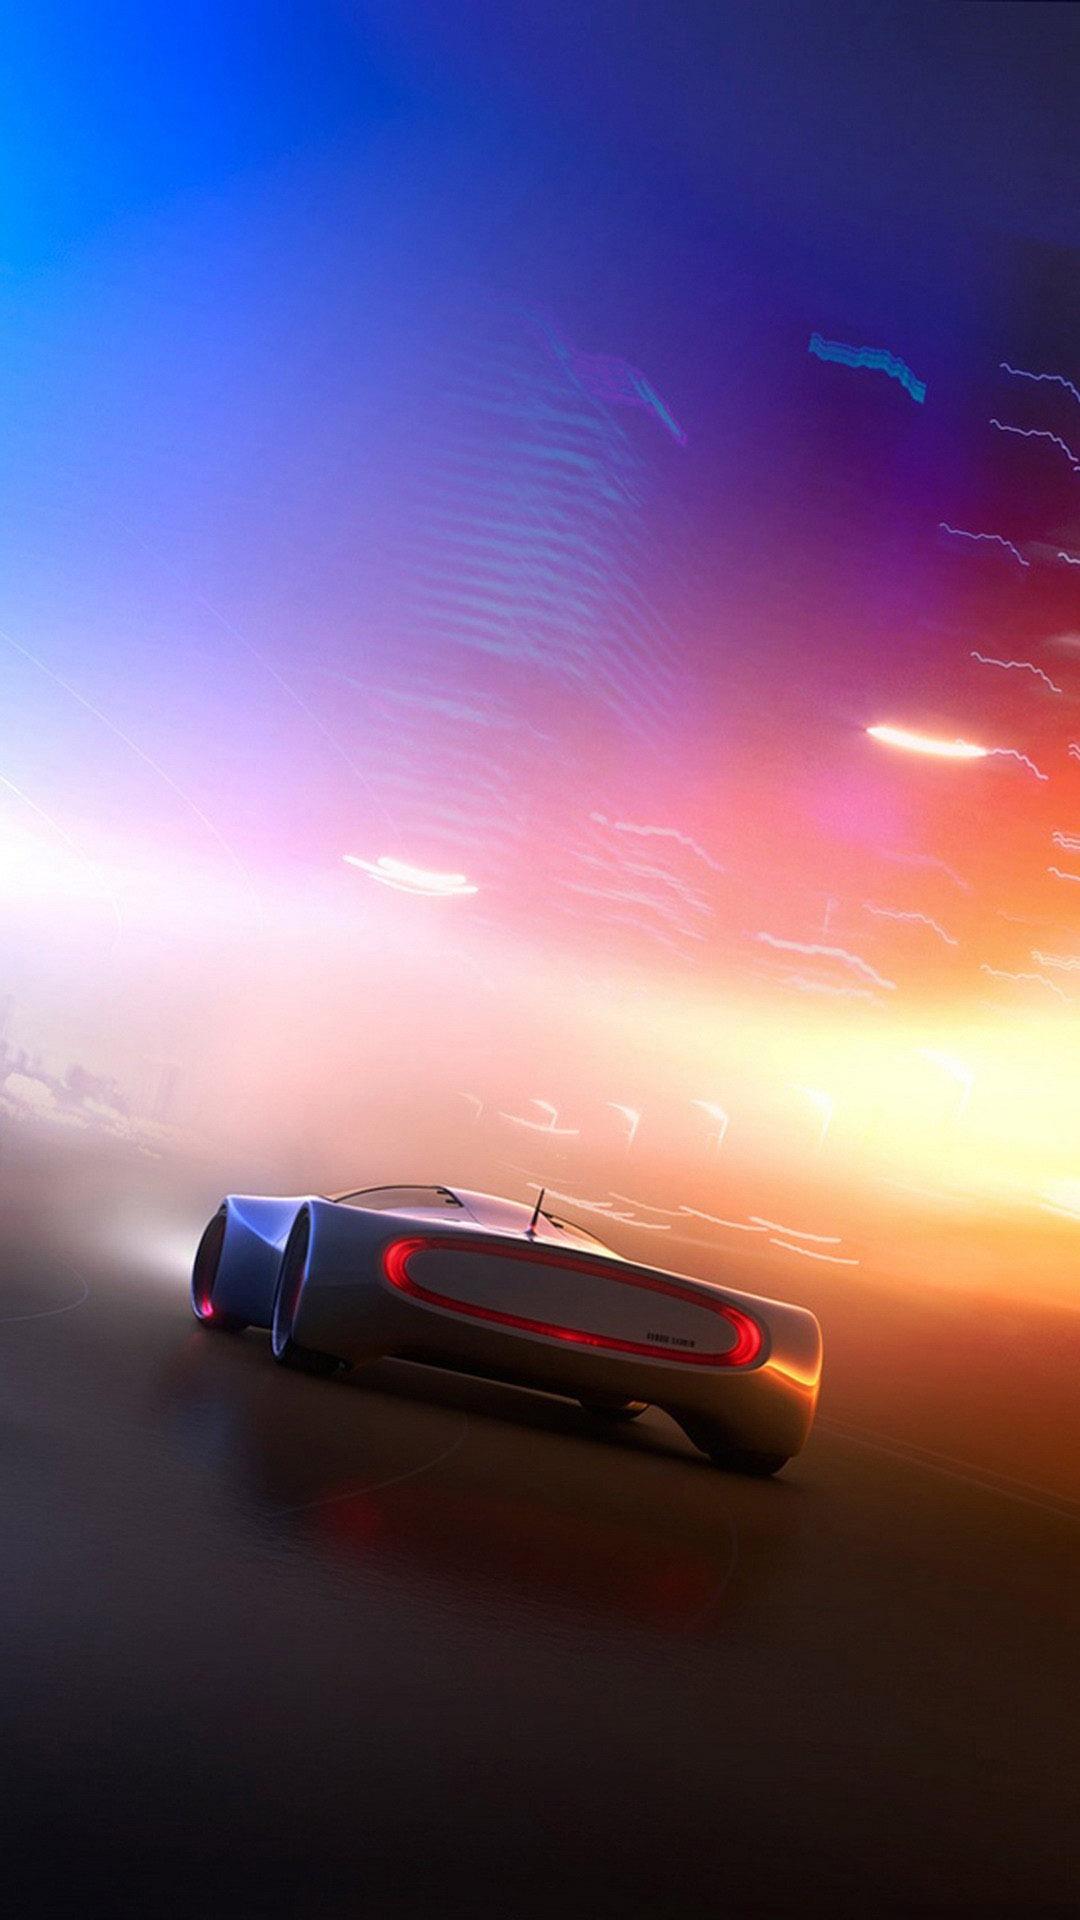 Futuristic car concept